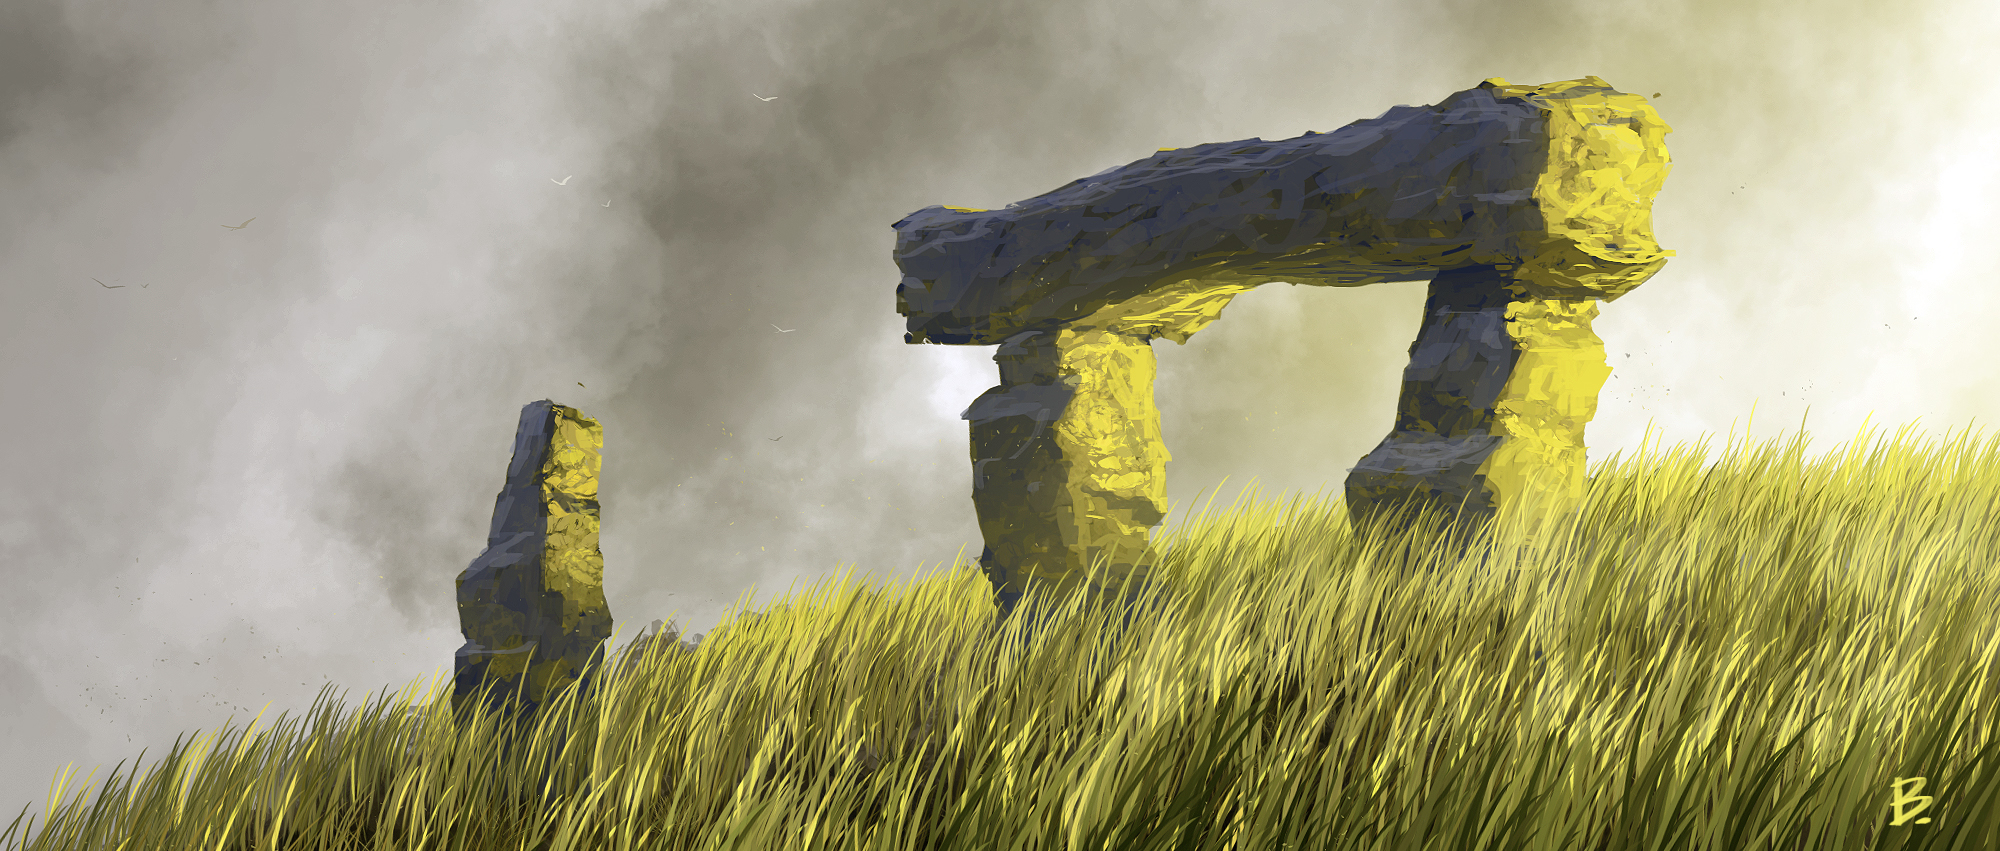 Speedpaint 253 - Monoliths by Balaskas